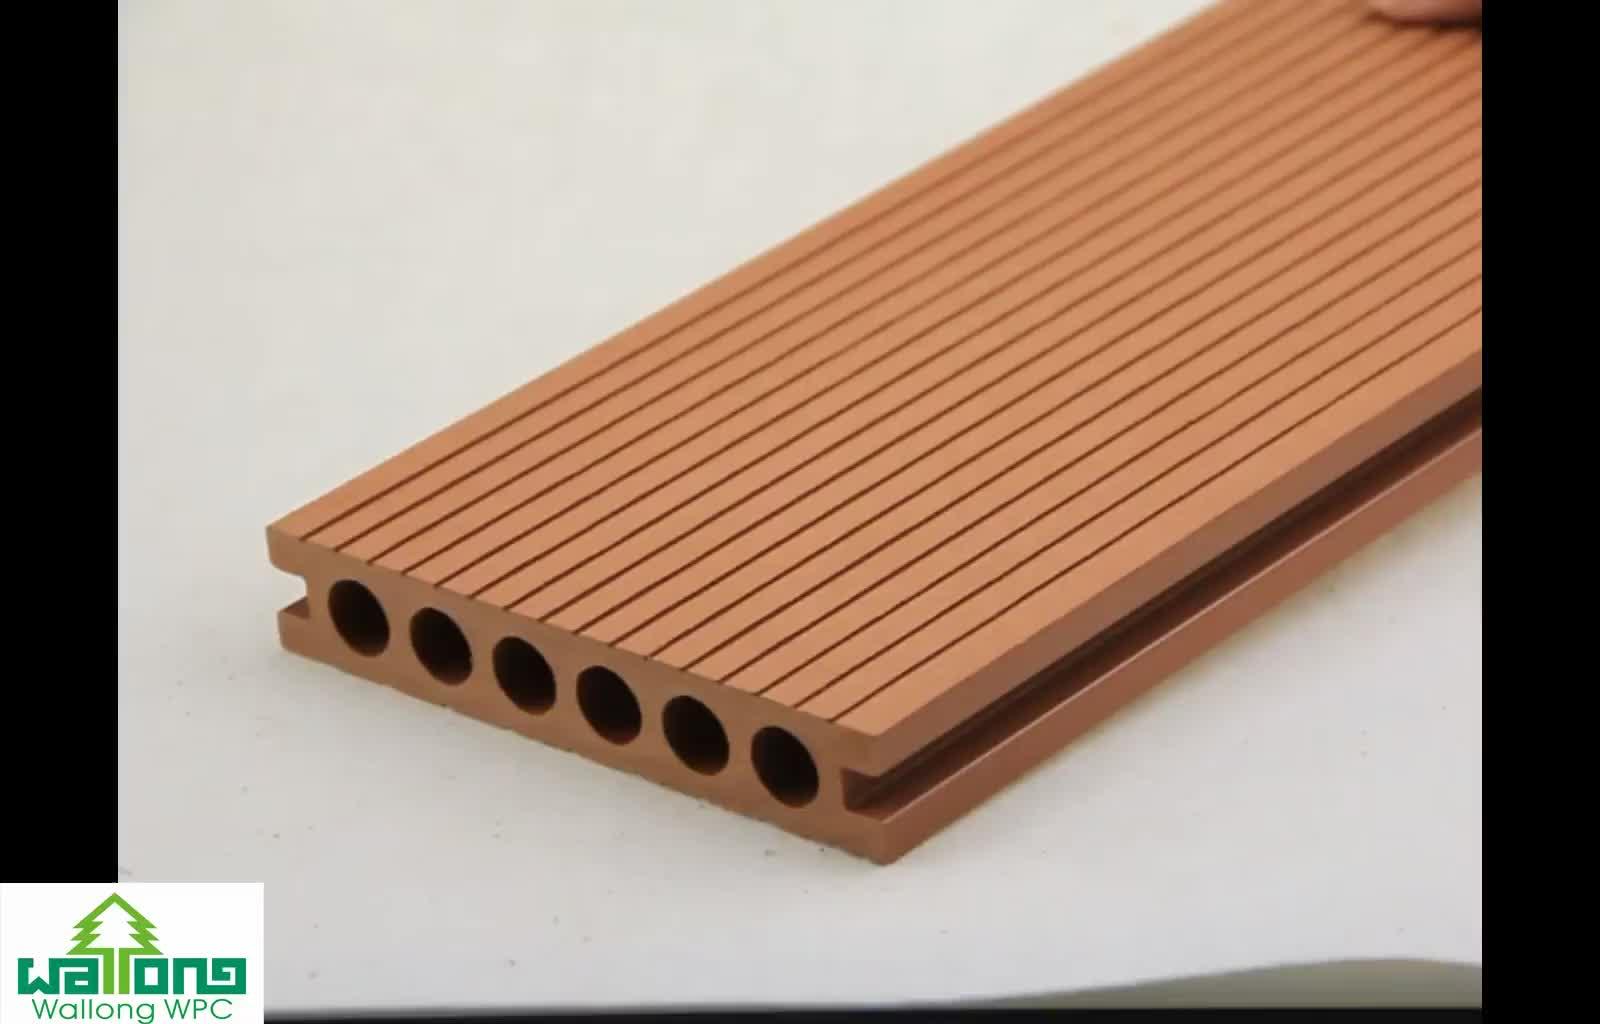 Dura wood plastic composite decking wpc outdoor patio buy dura wood plastic composite decking wpc outdoor patio baanklon Images